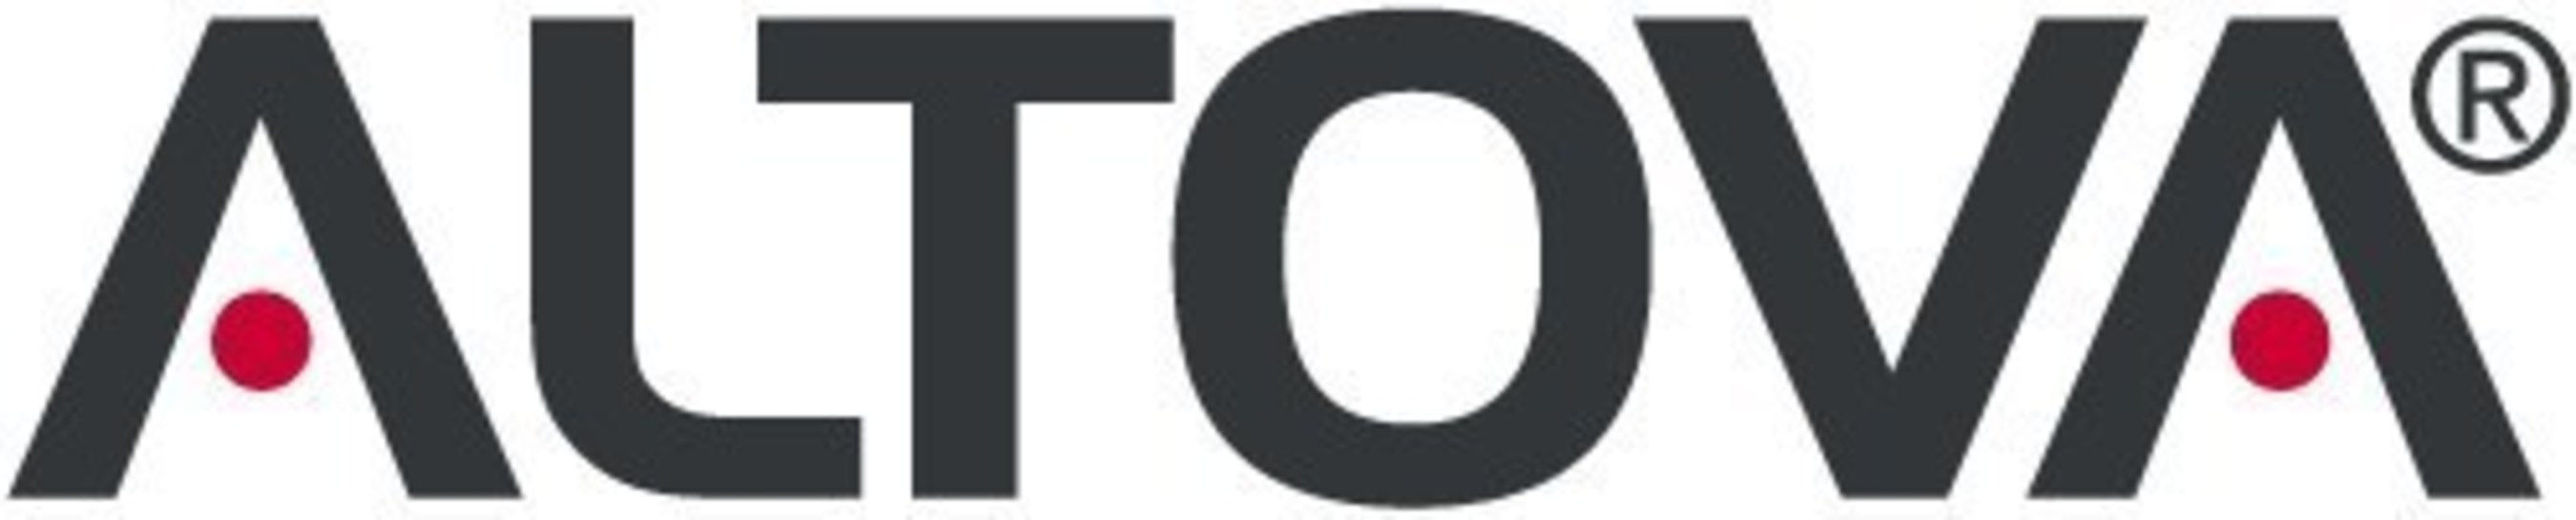 Altova Unveils Additional Support for Big Data, Databases